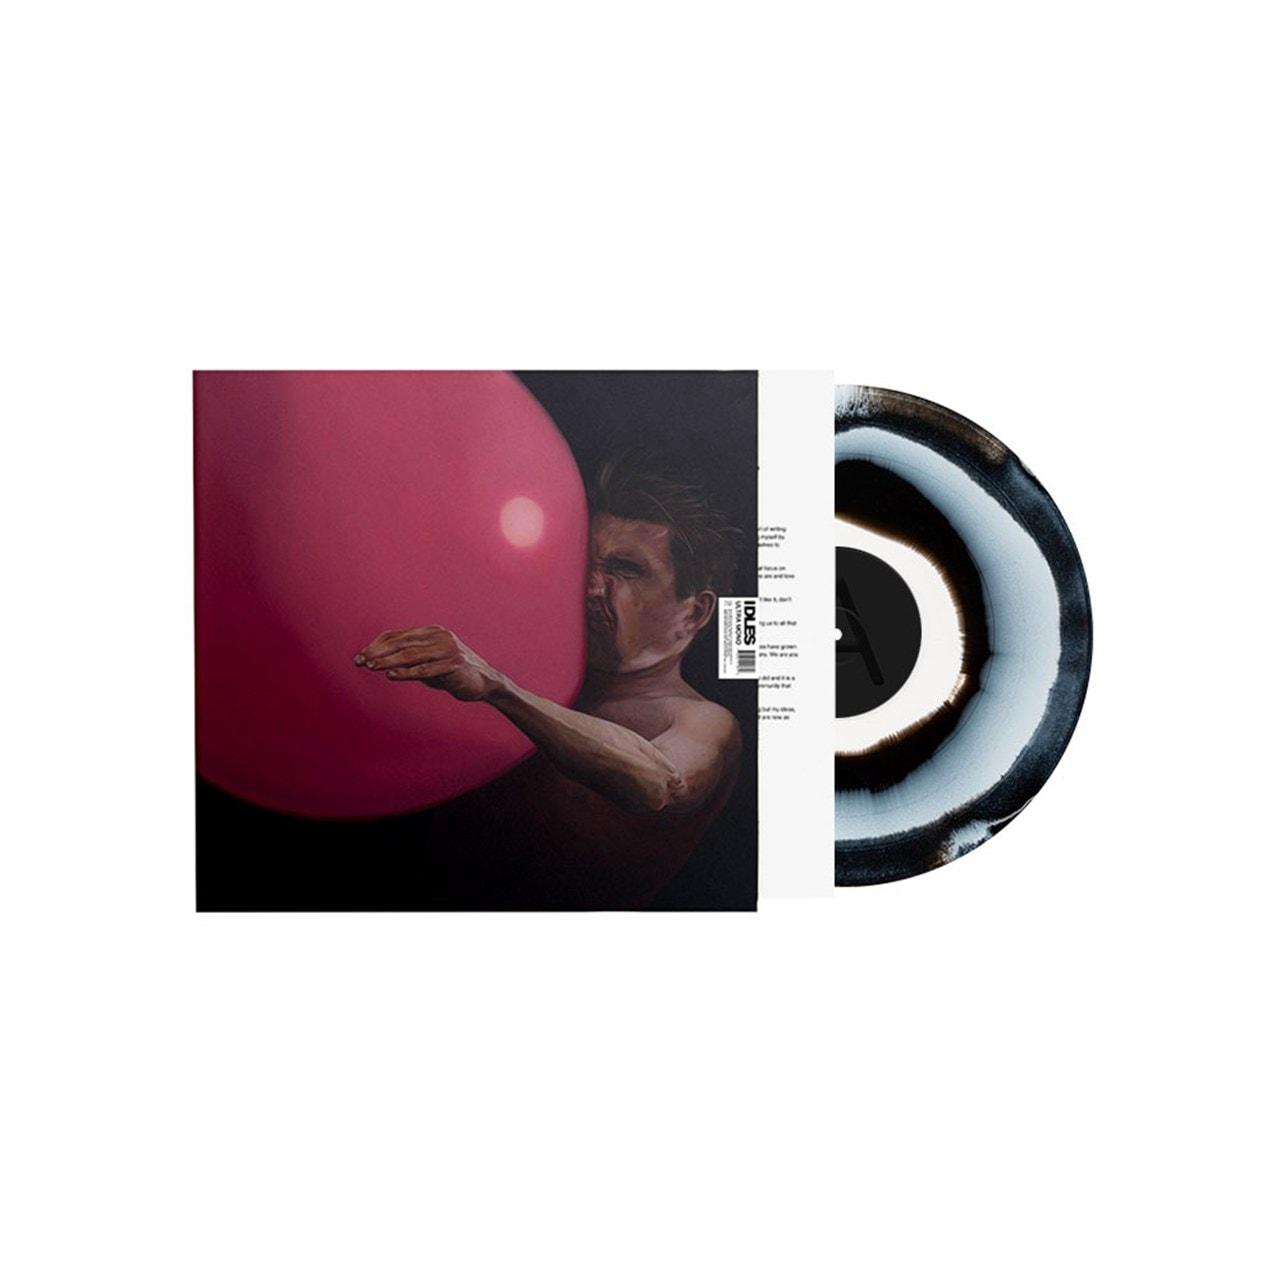 Ultra Mono (Limited Edition Vortex Vinyl) - 1